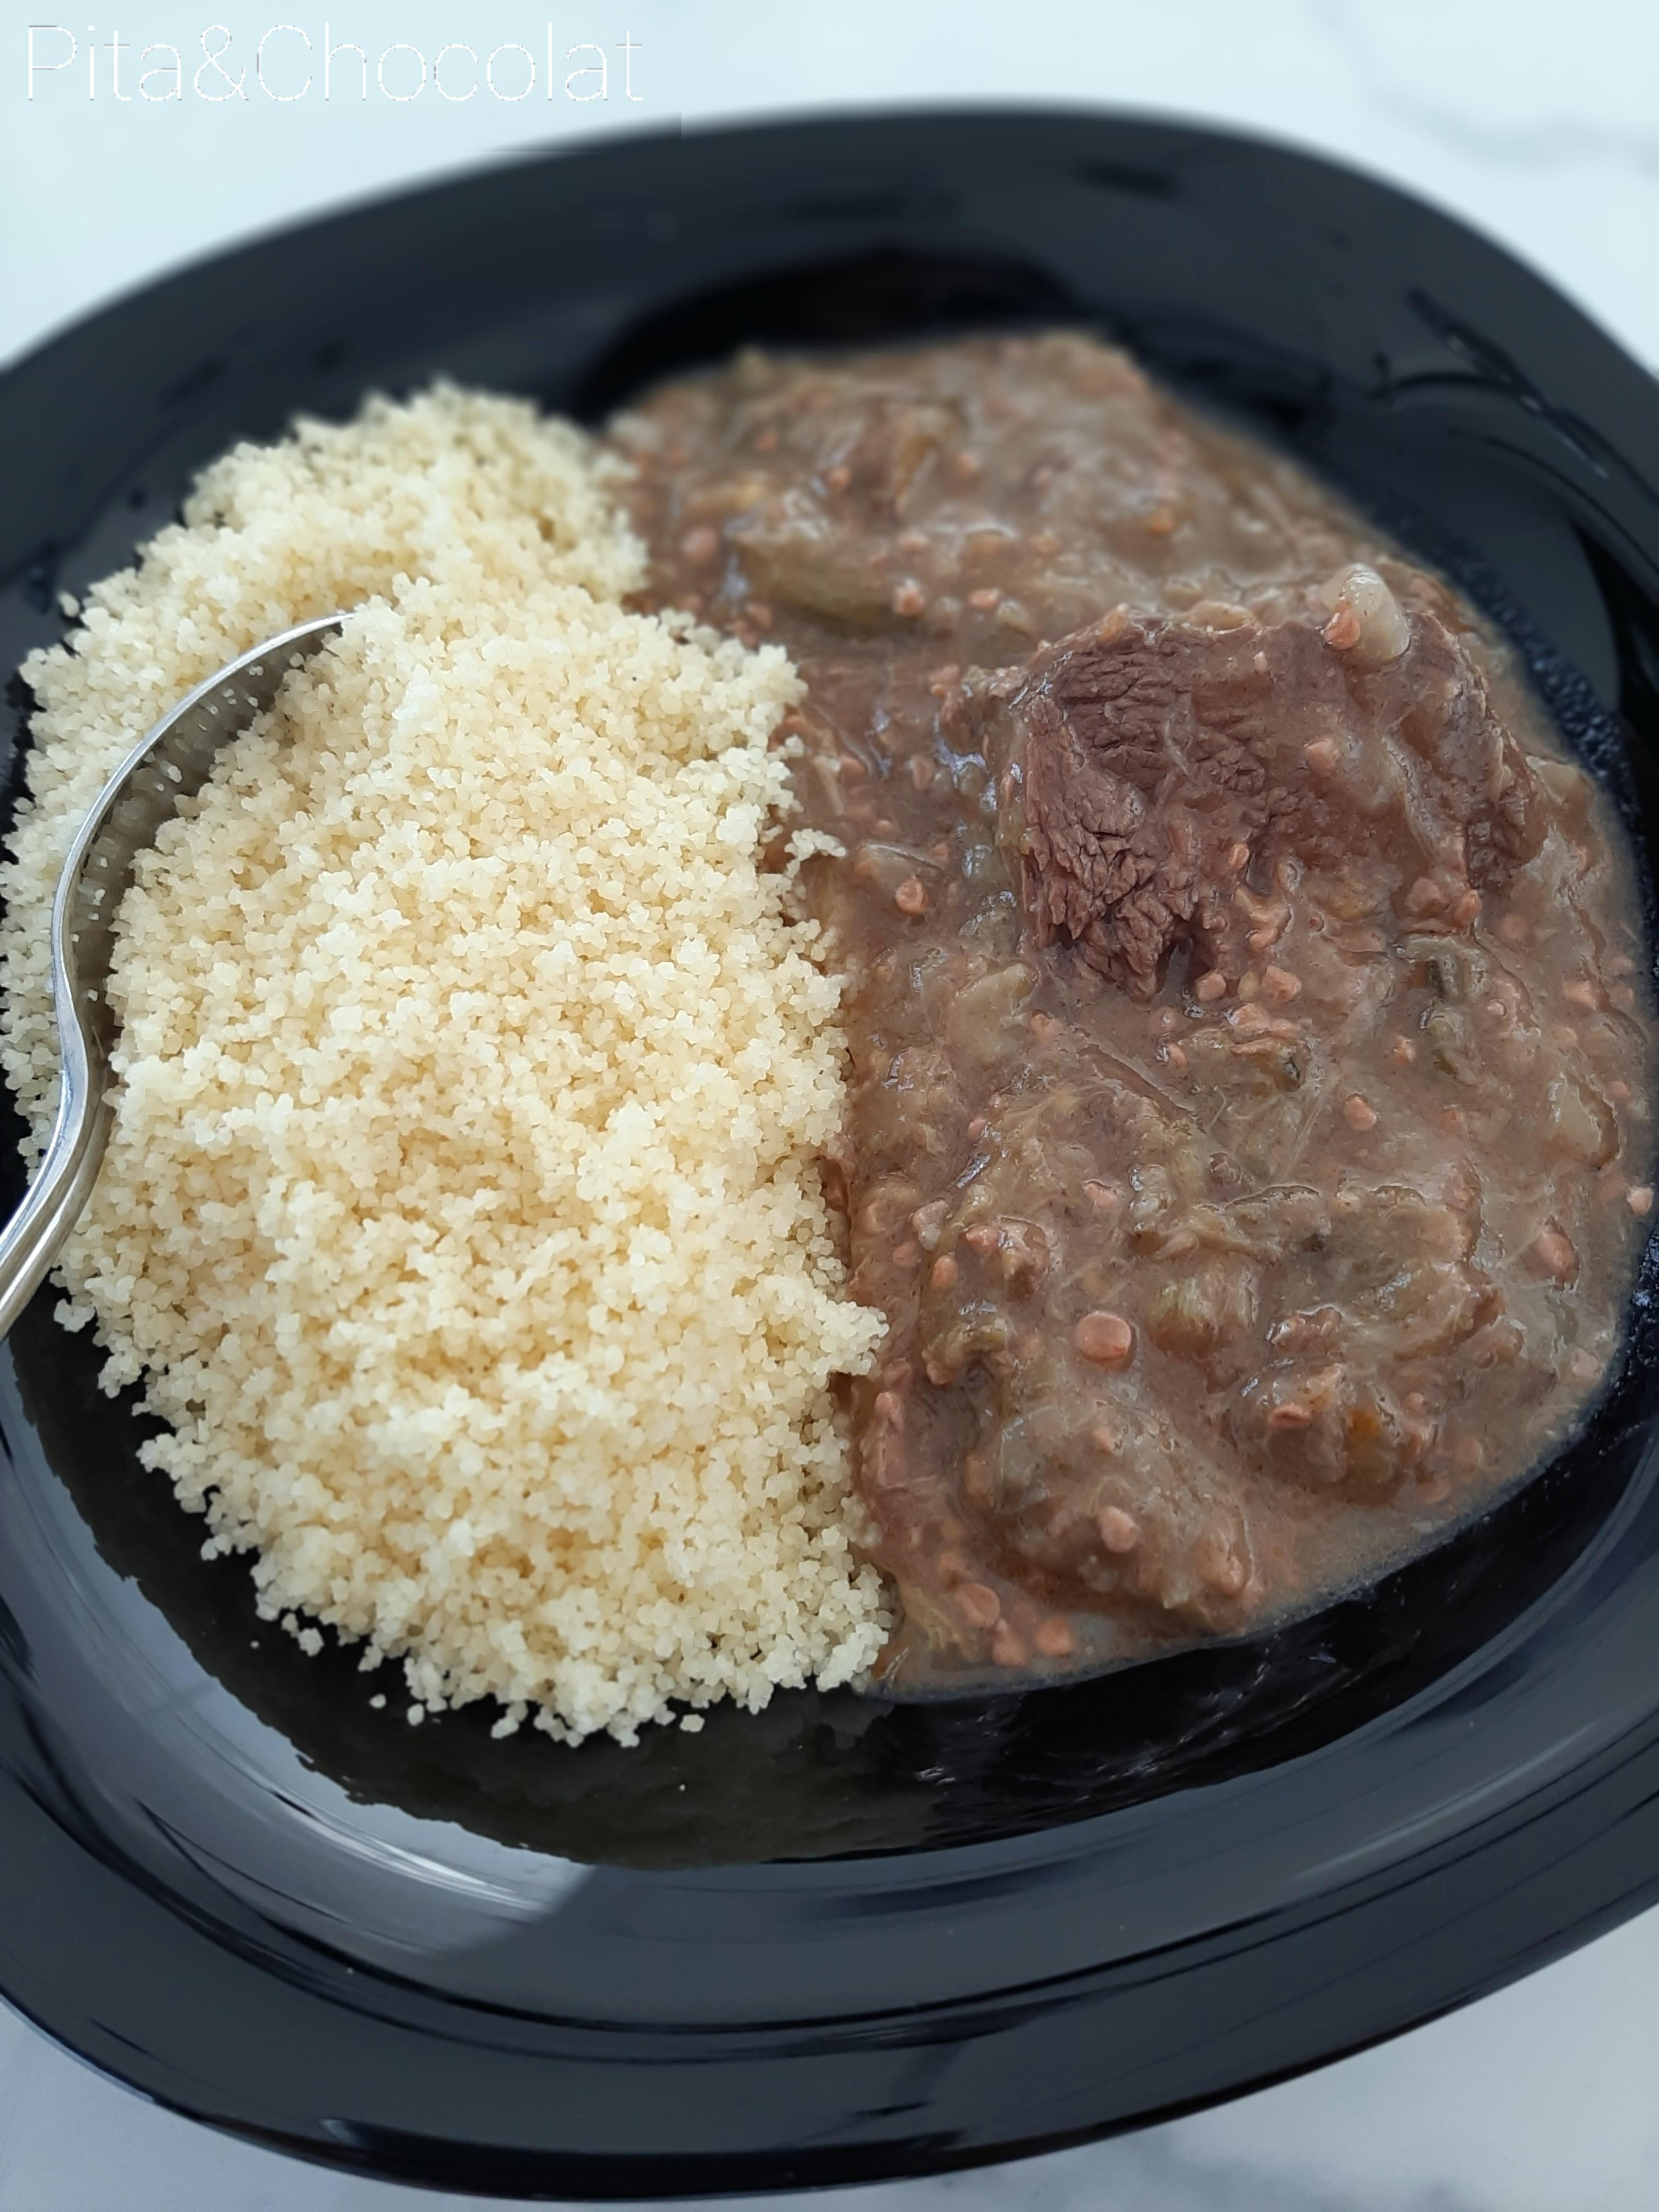 Gnaouia - Ragoût de gombos à la viande